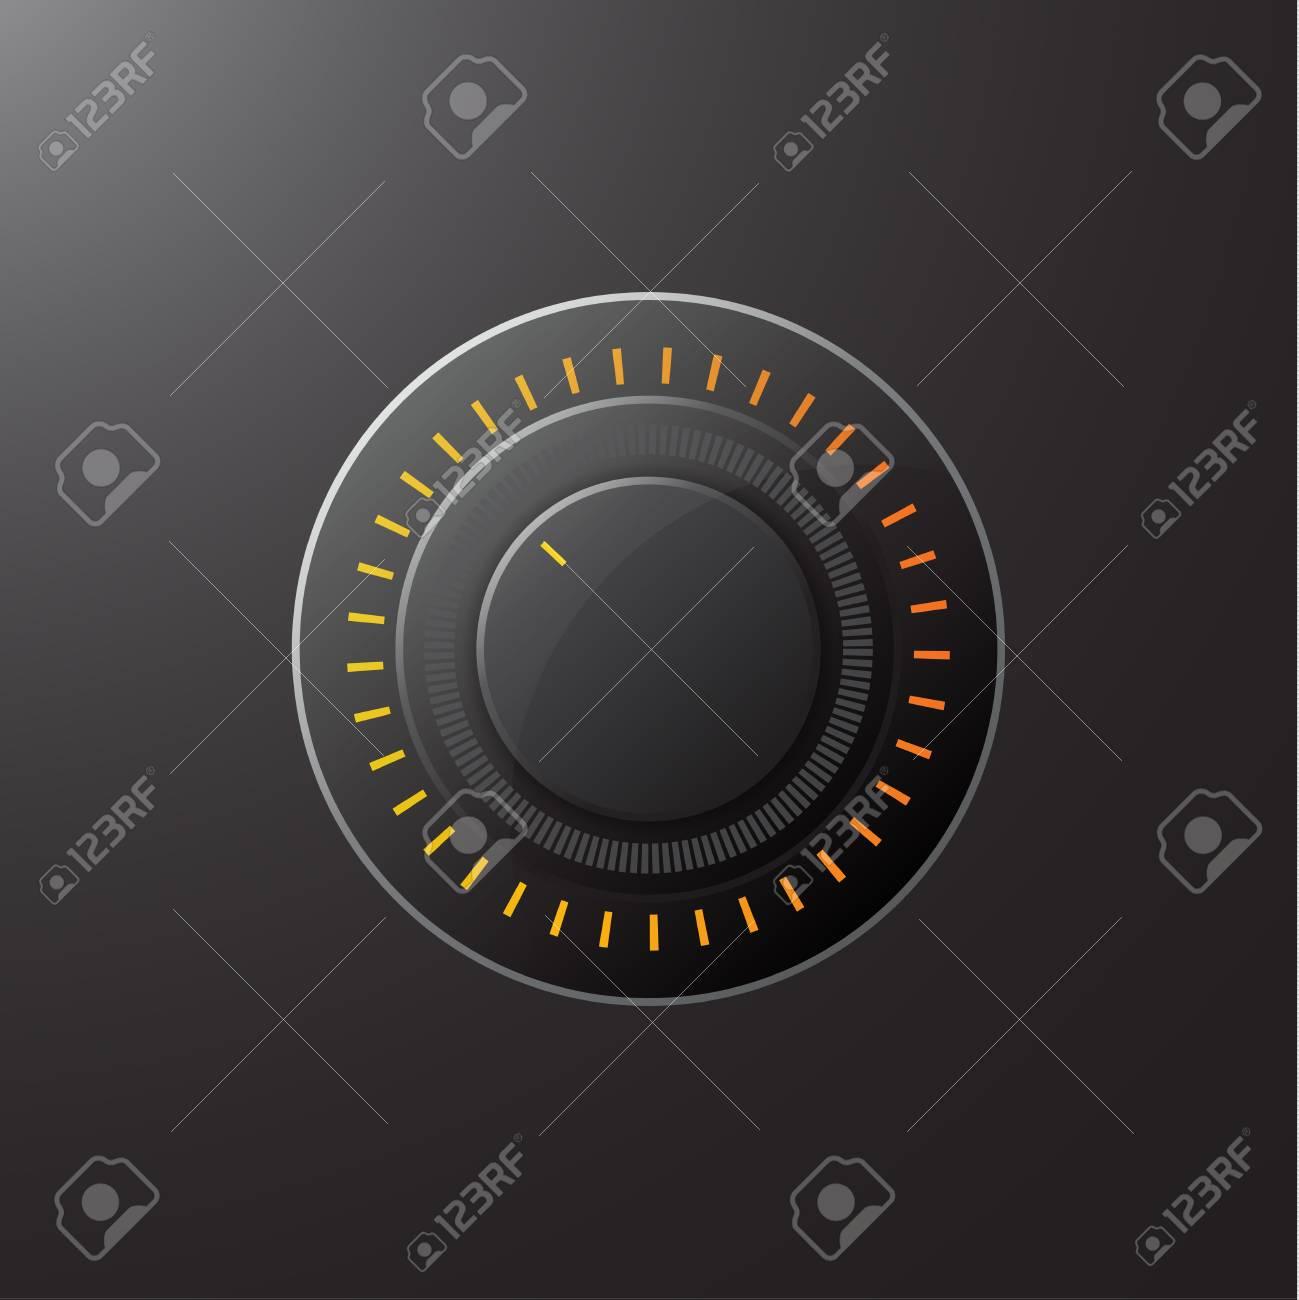 Manual control knob plastic, volume settings, sound control. Vector illustration. - 112038815